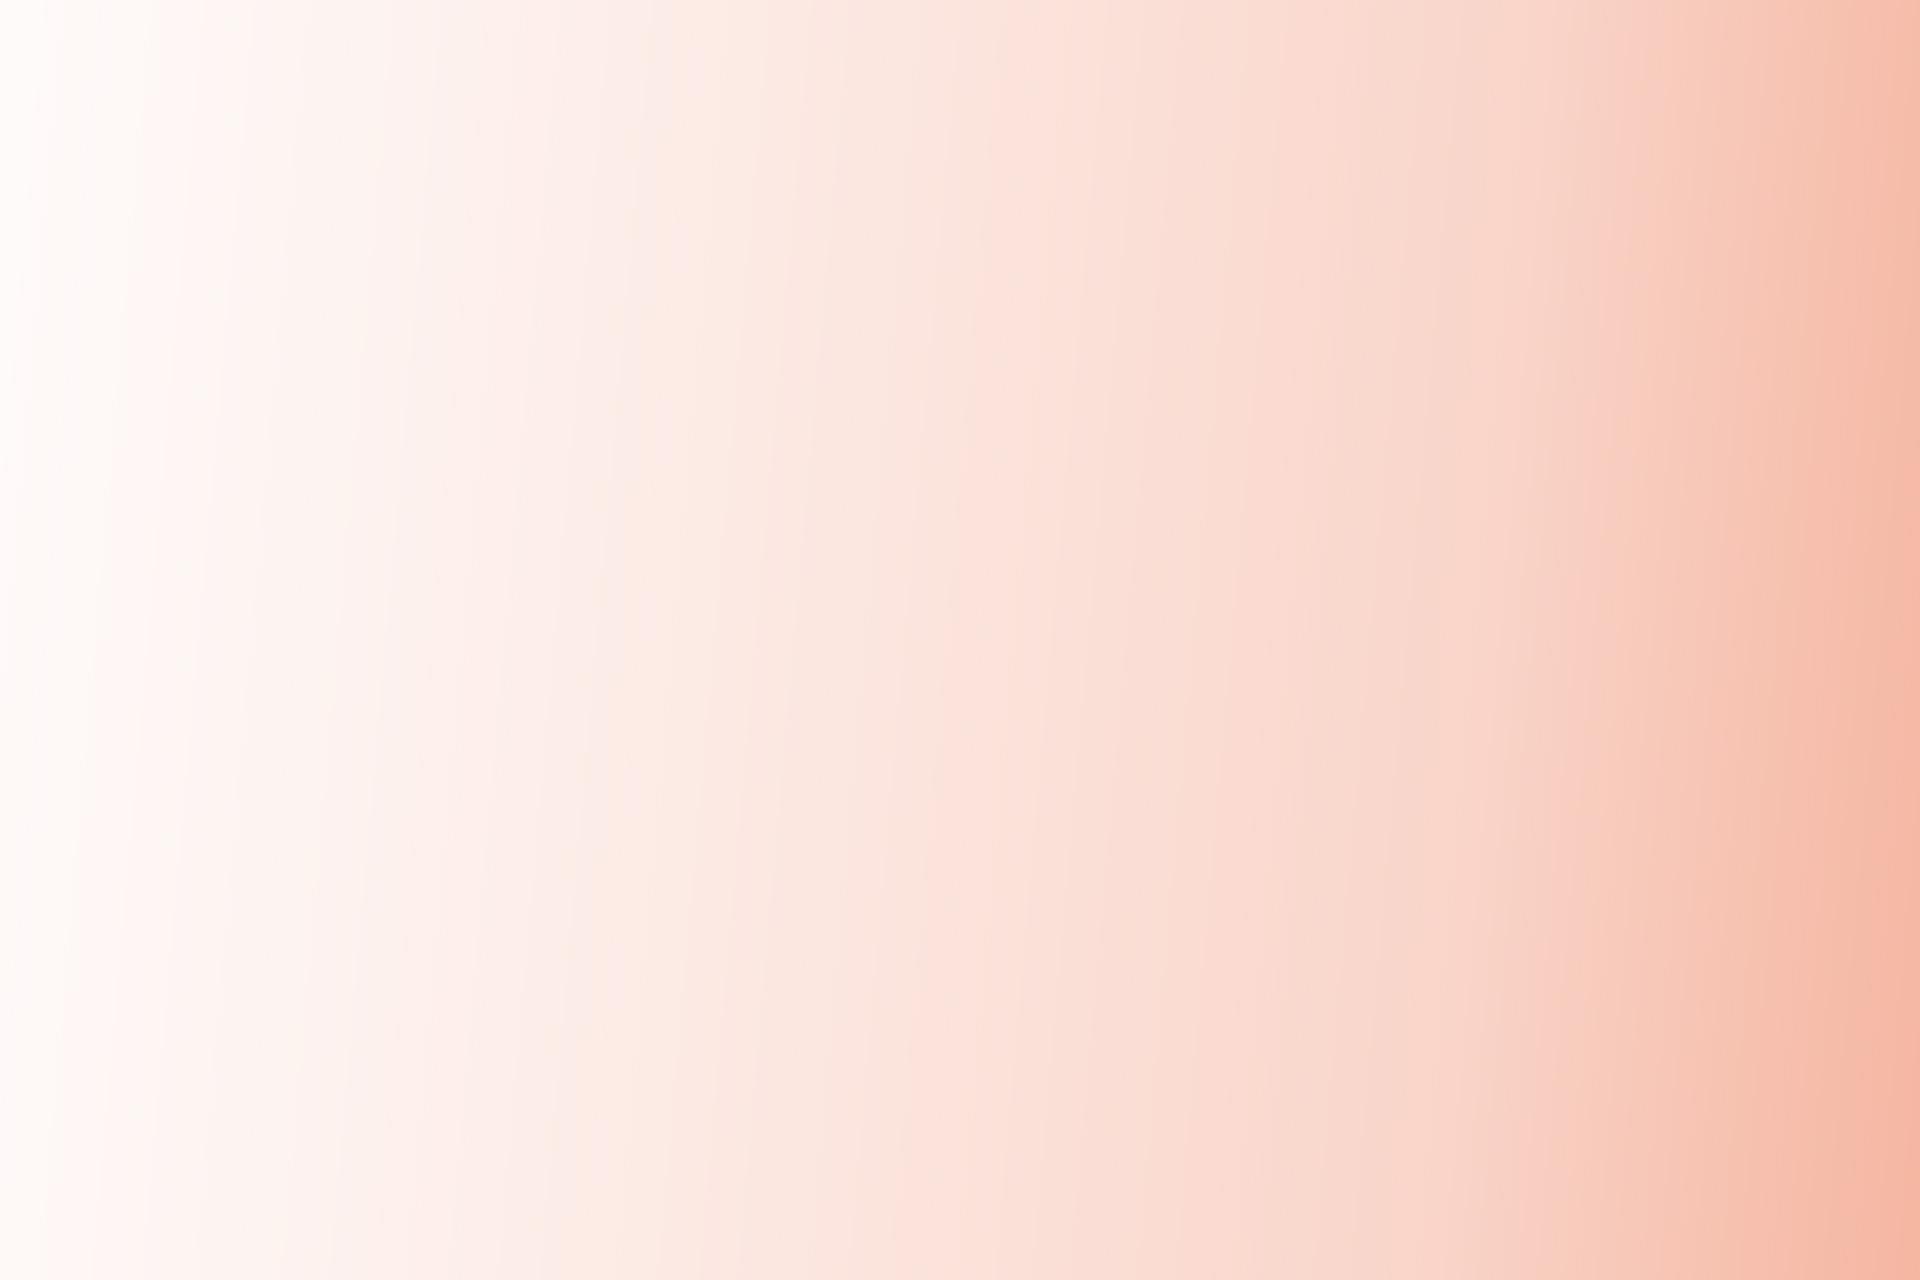 fond orange cogis